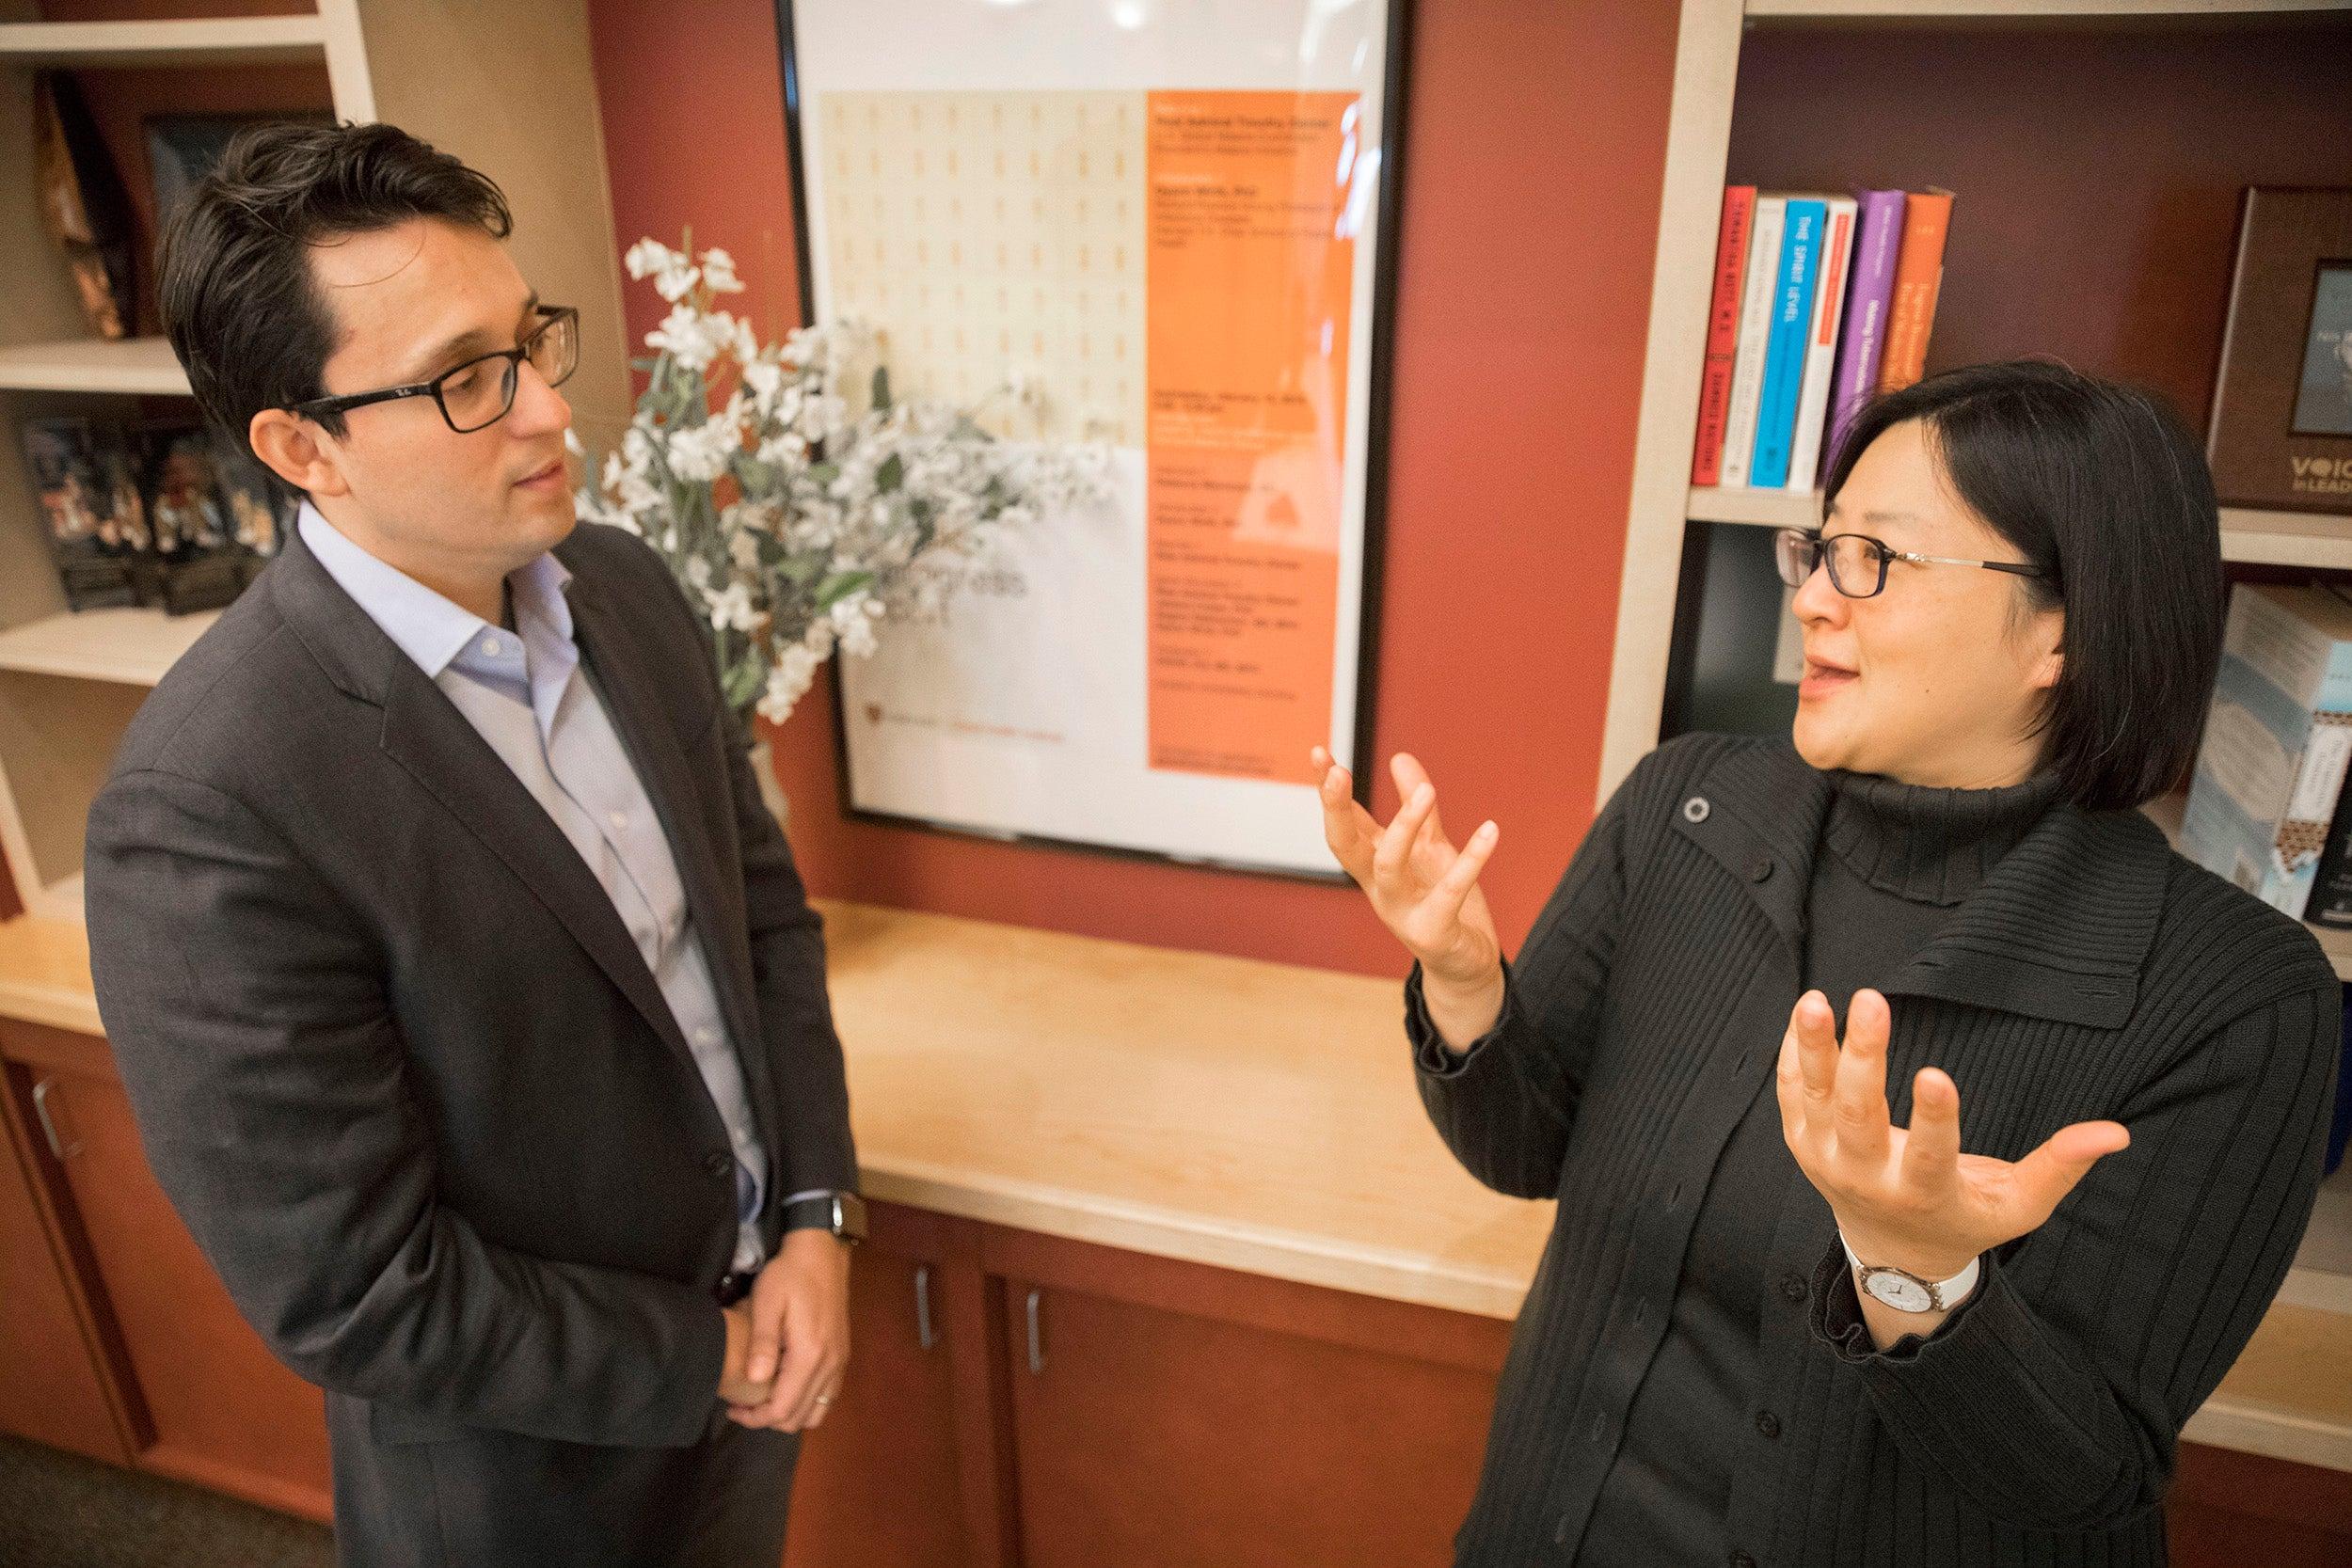 arvard Professor Winnie Yip and Burke Fellow Jose Figueroa